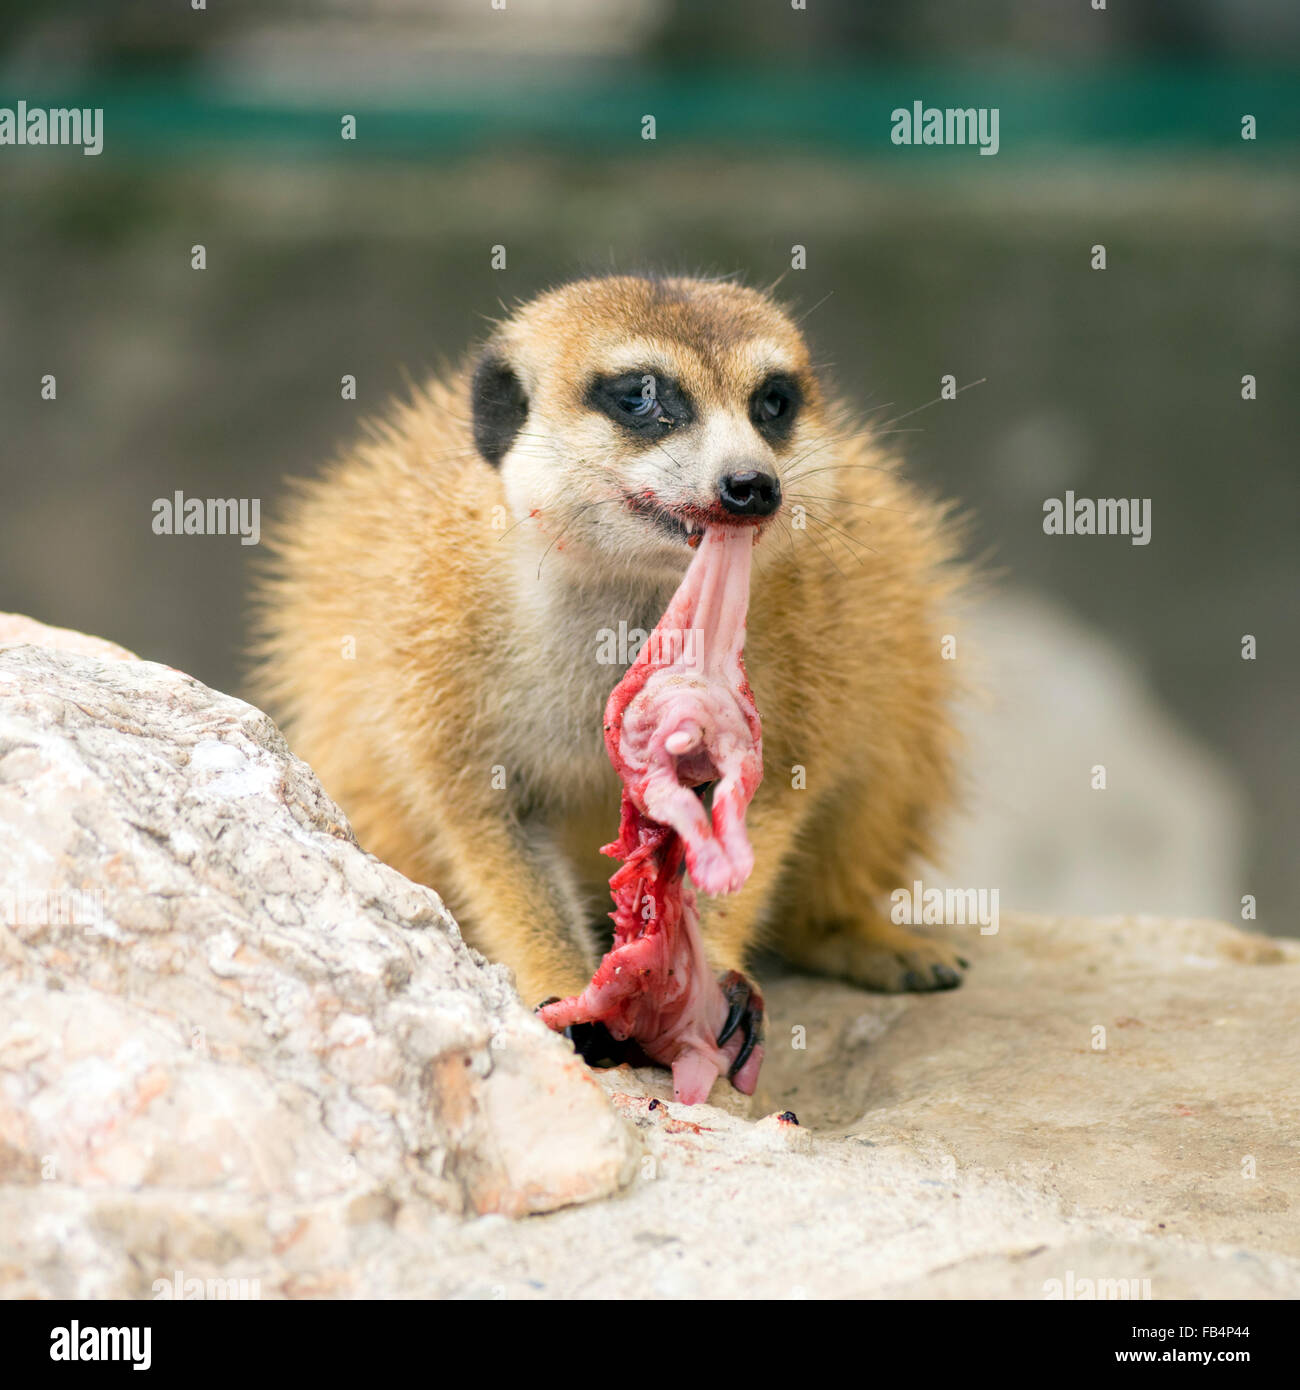 Meerkat (Suricata suricatta) eating a baby bunny - Stock Image